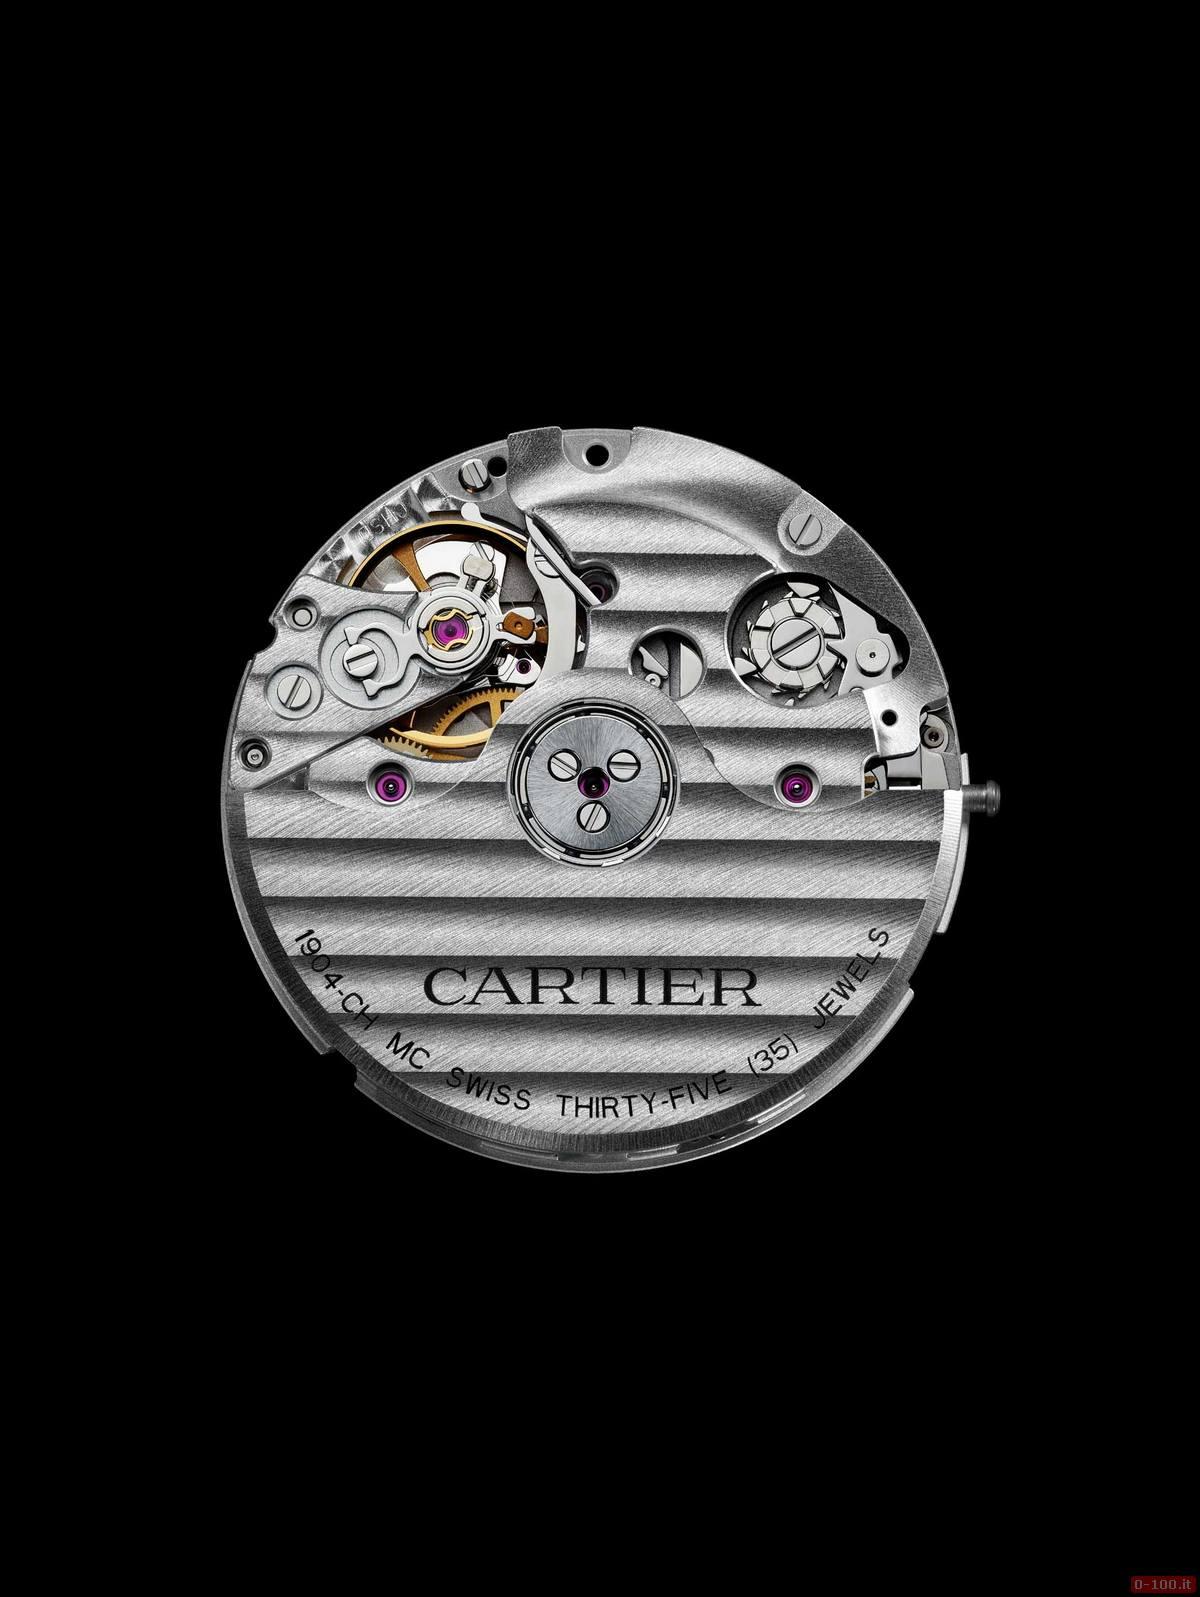 Cartier Calibre Chronograph Watch _0-1008